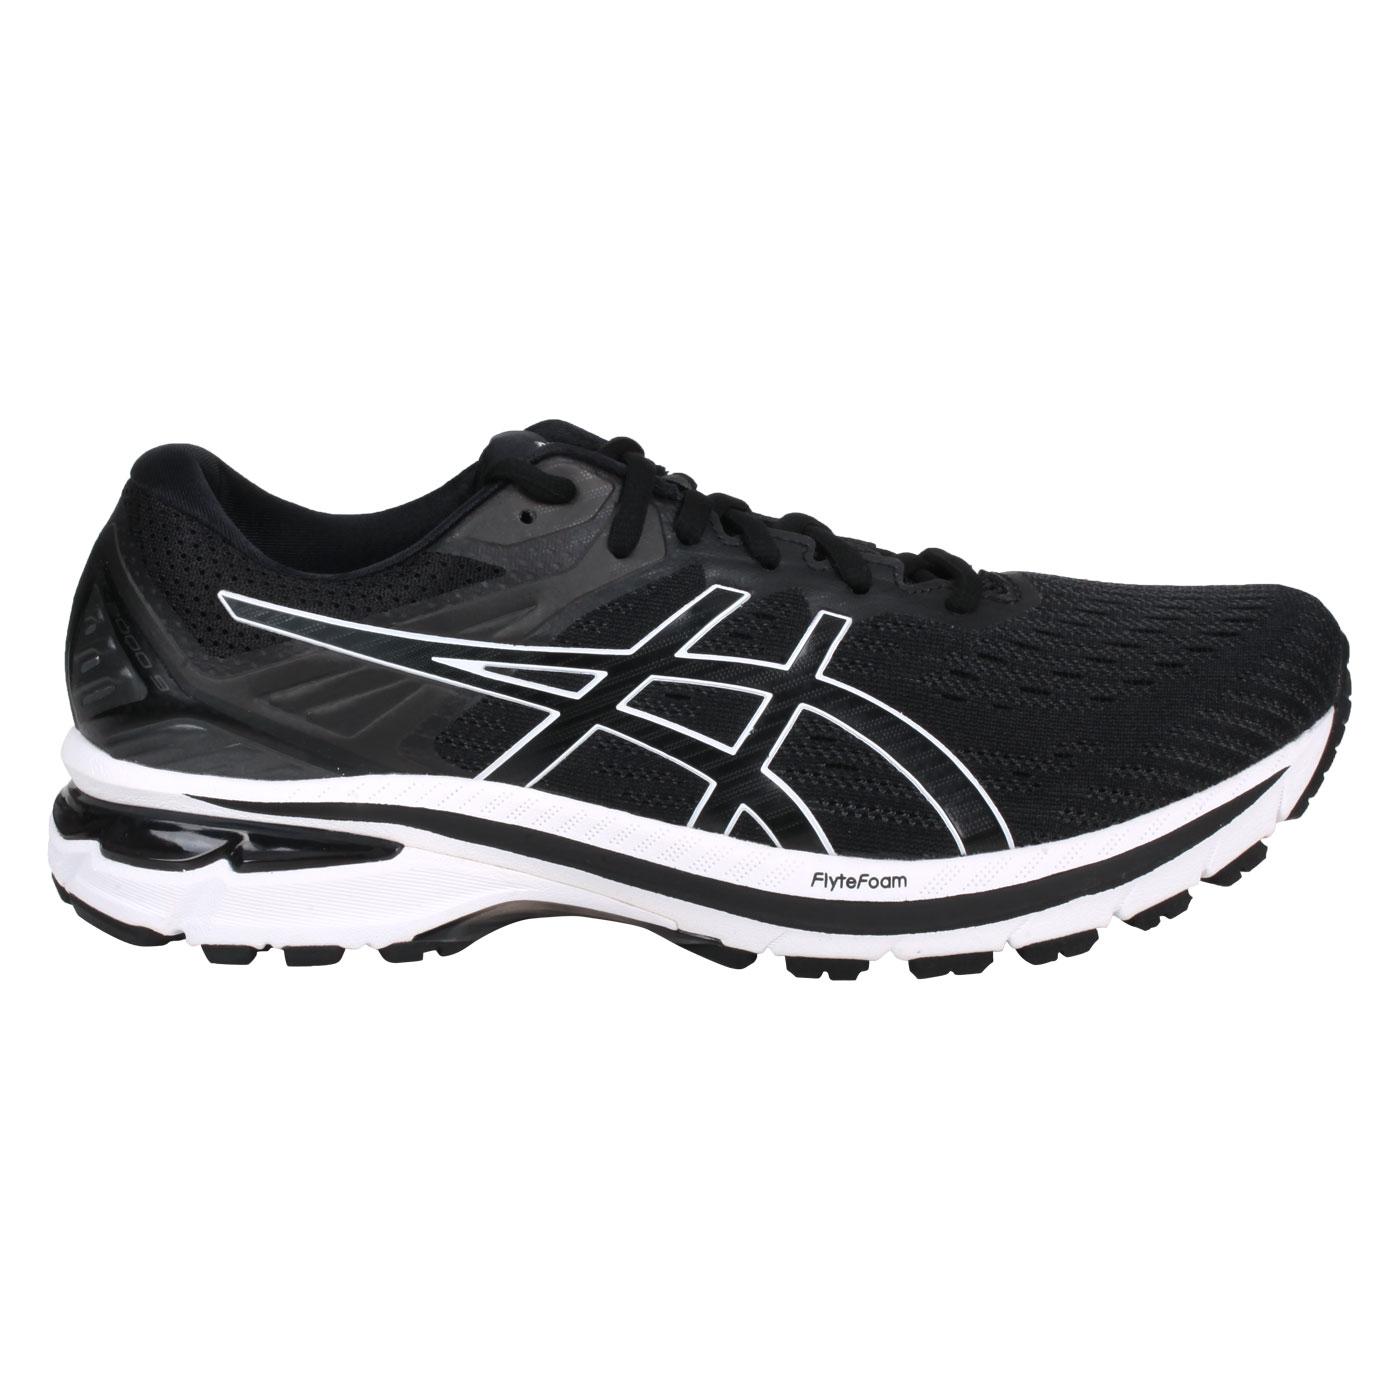 ASICS 男款慢跑鞋-4E  @GT-2000 9@1011A987-001